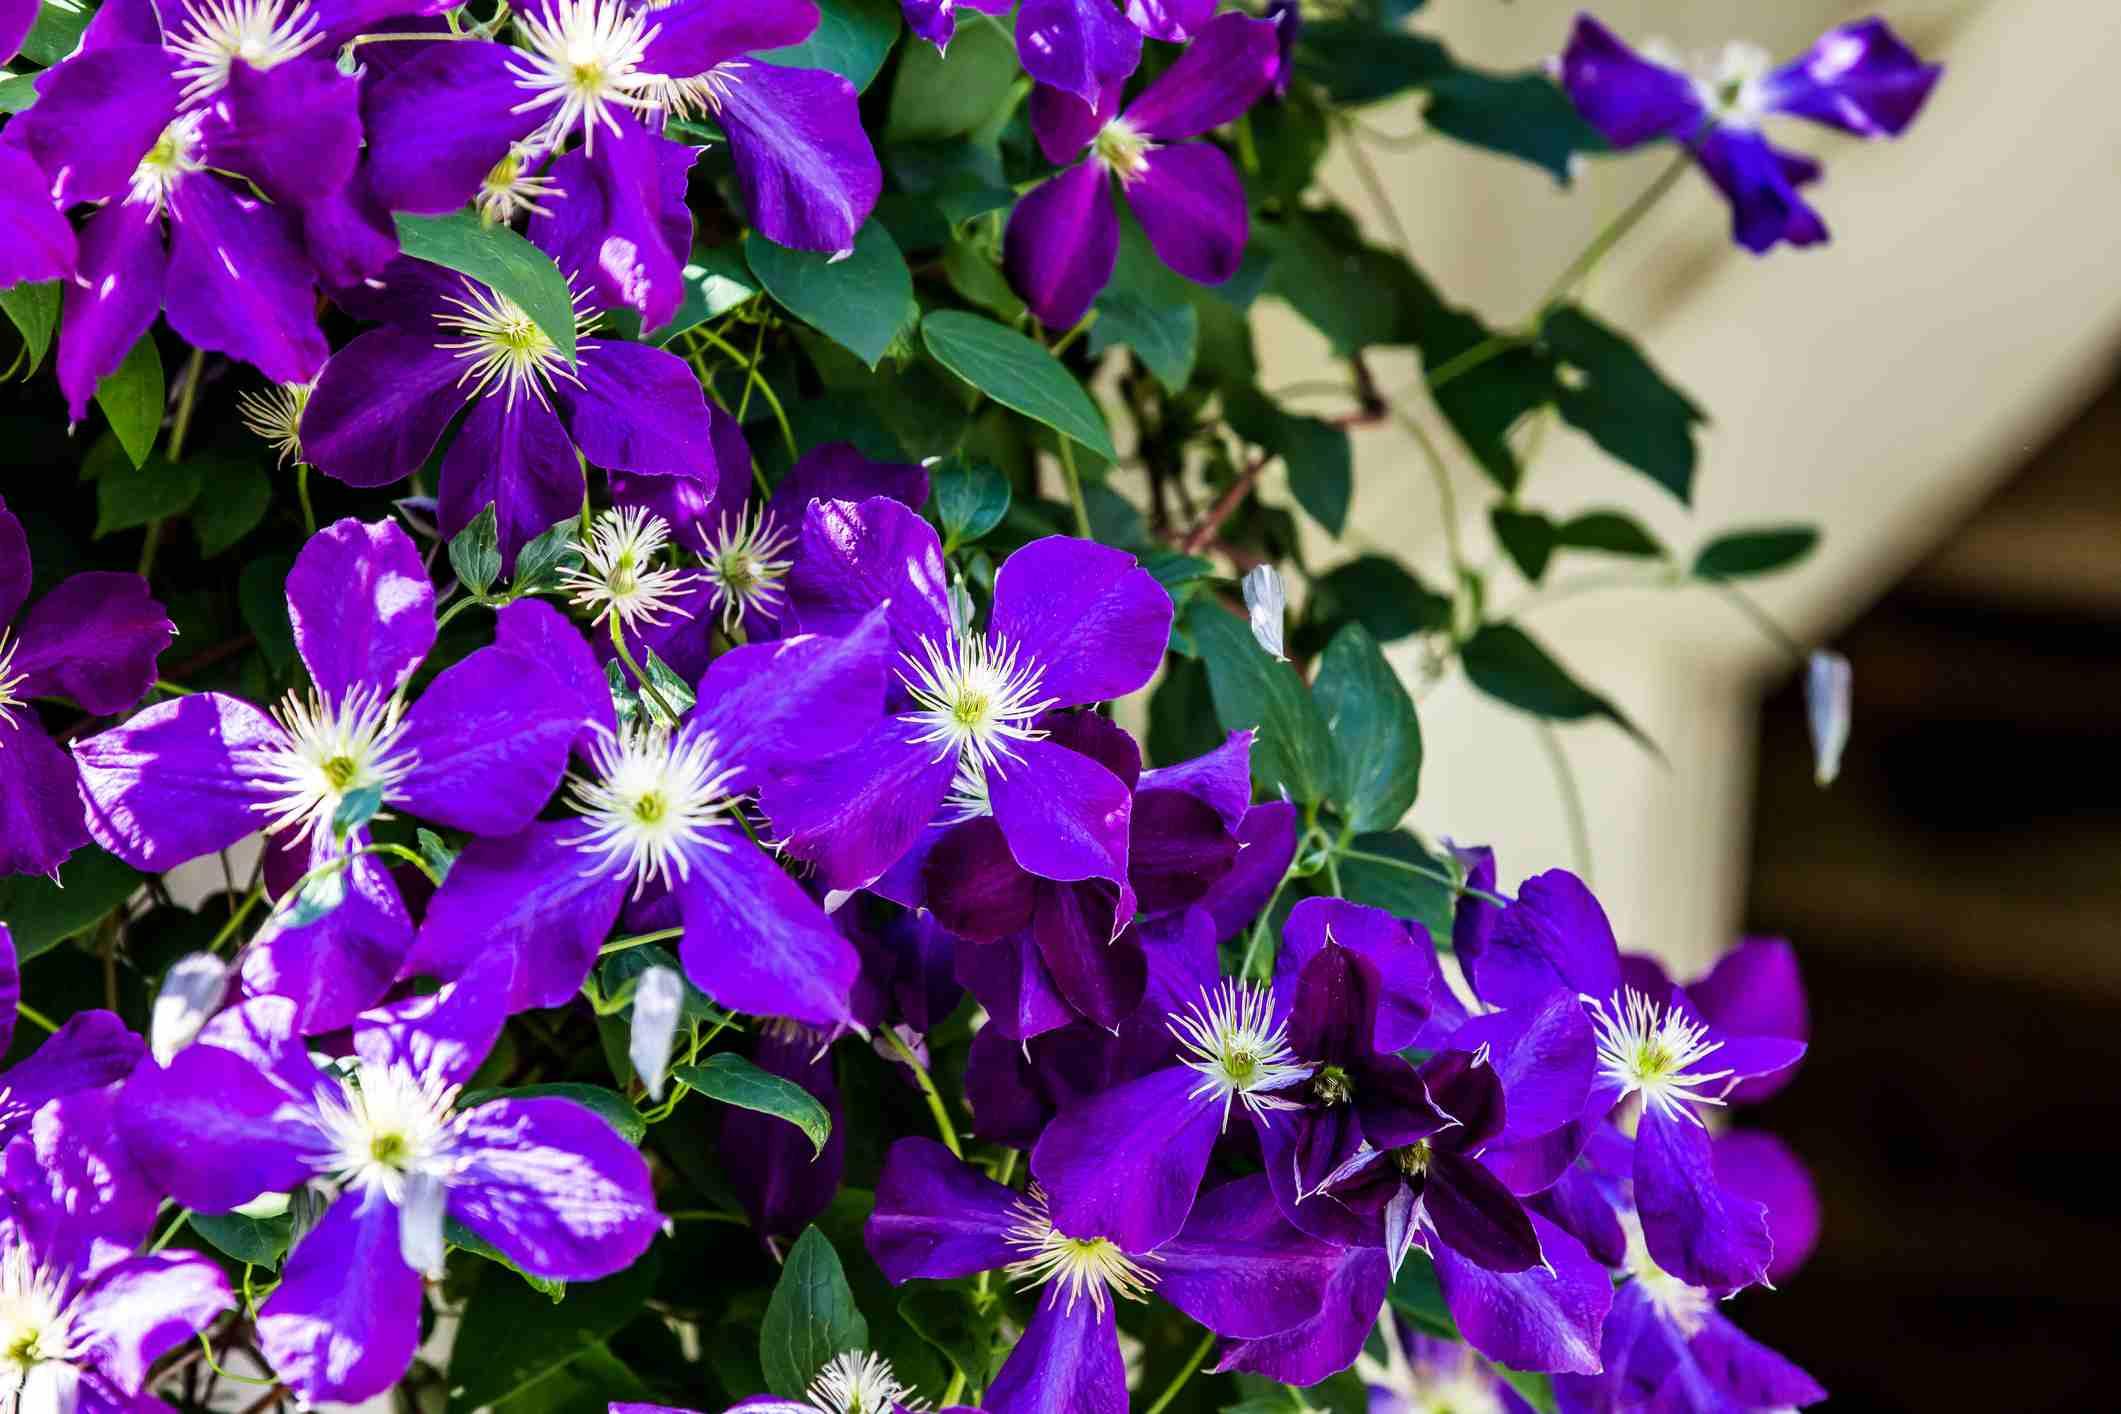 Pictures of purple flowers izmirmasajfo